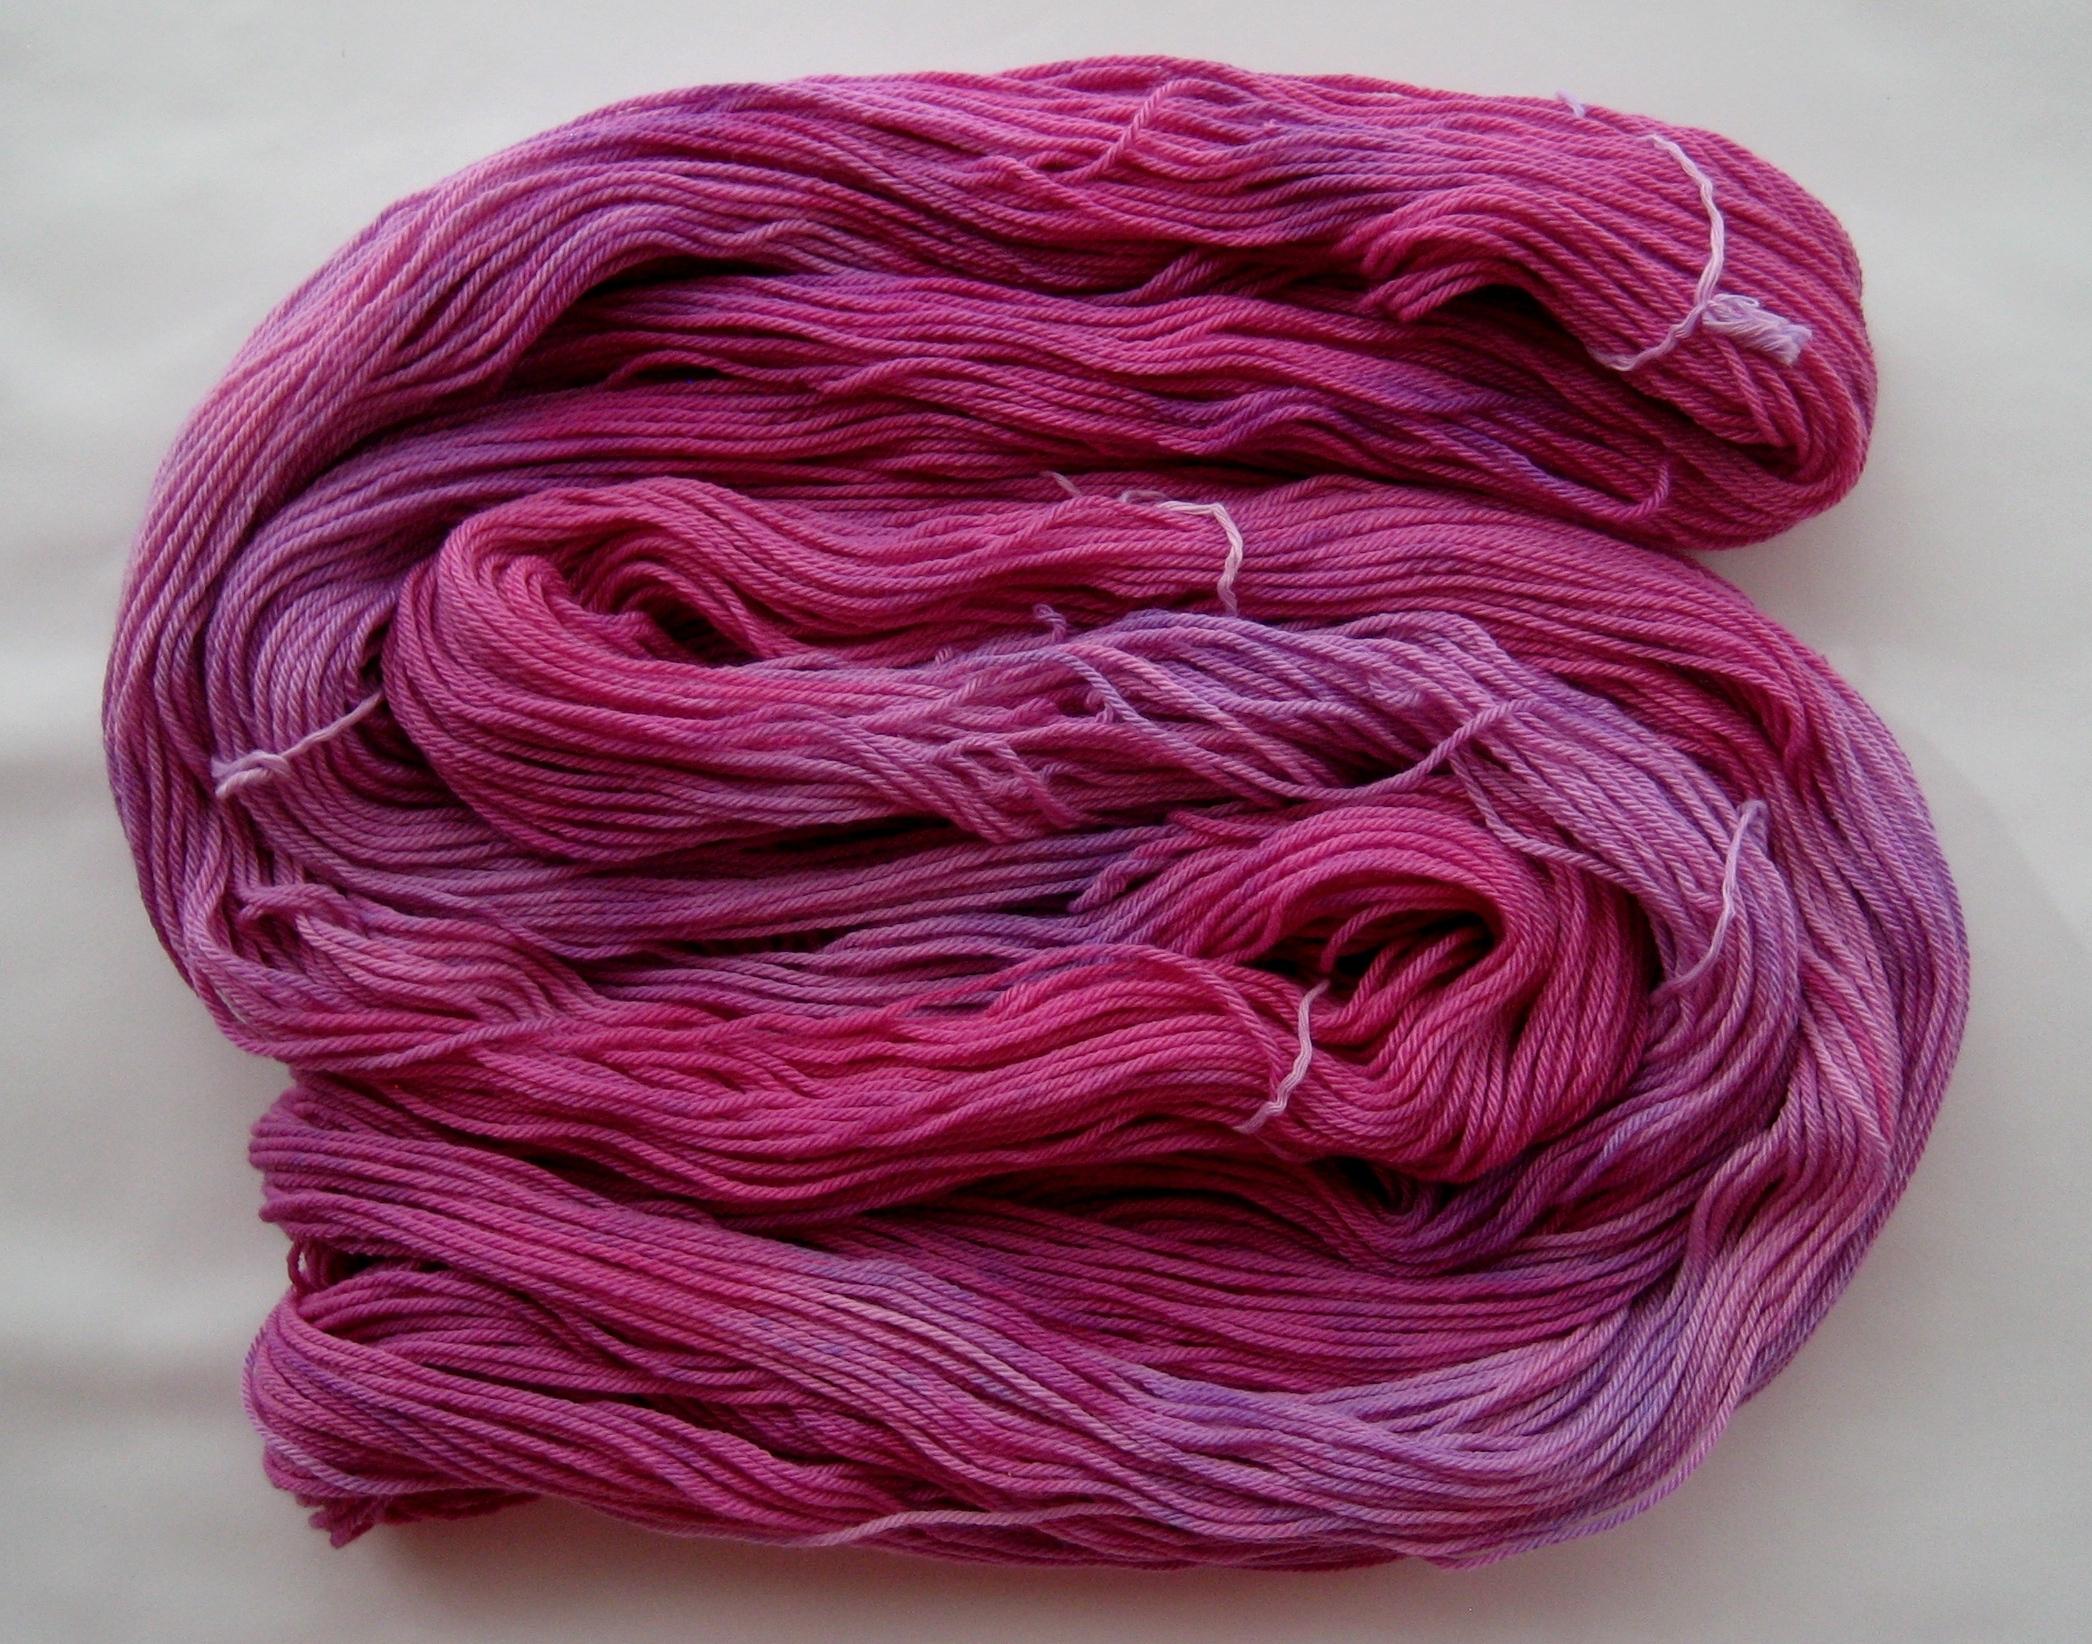 garnyarn-håndfarvet-garn-mellem-merinould-baeredygtig-gammelrosa-lilla